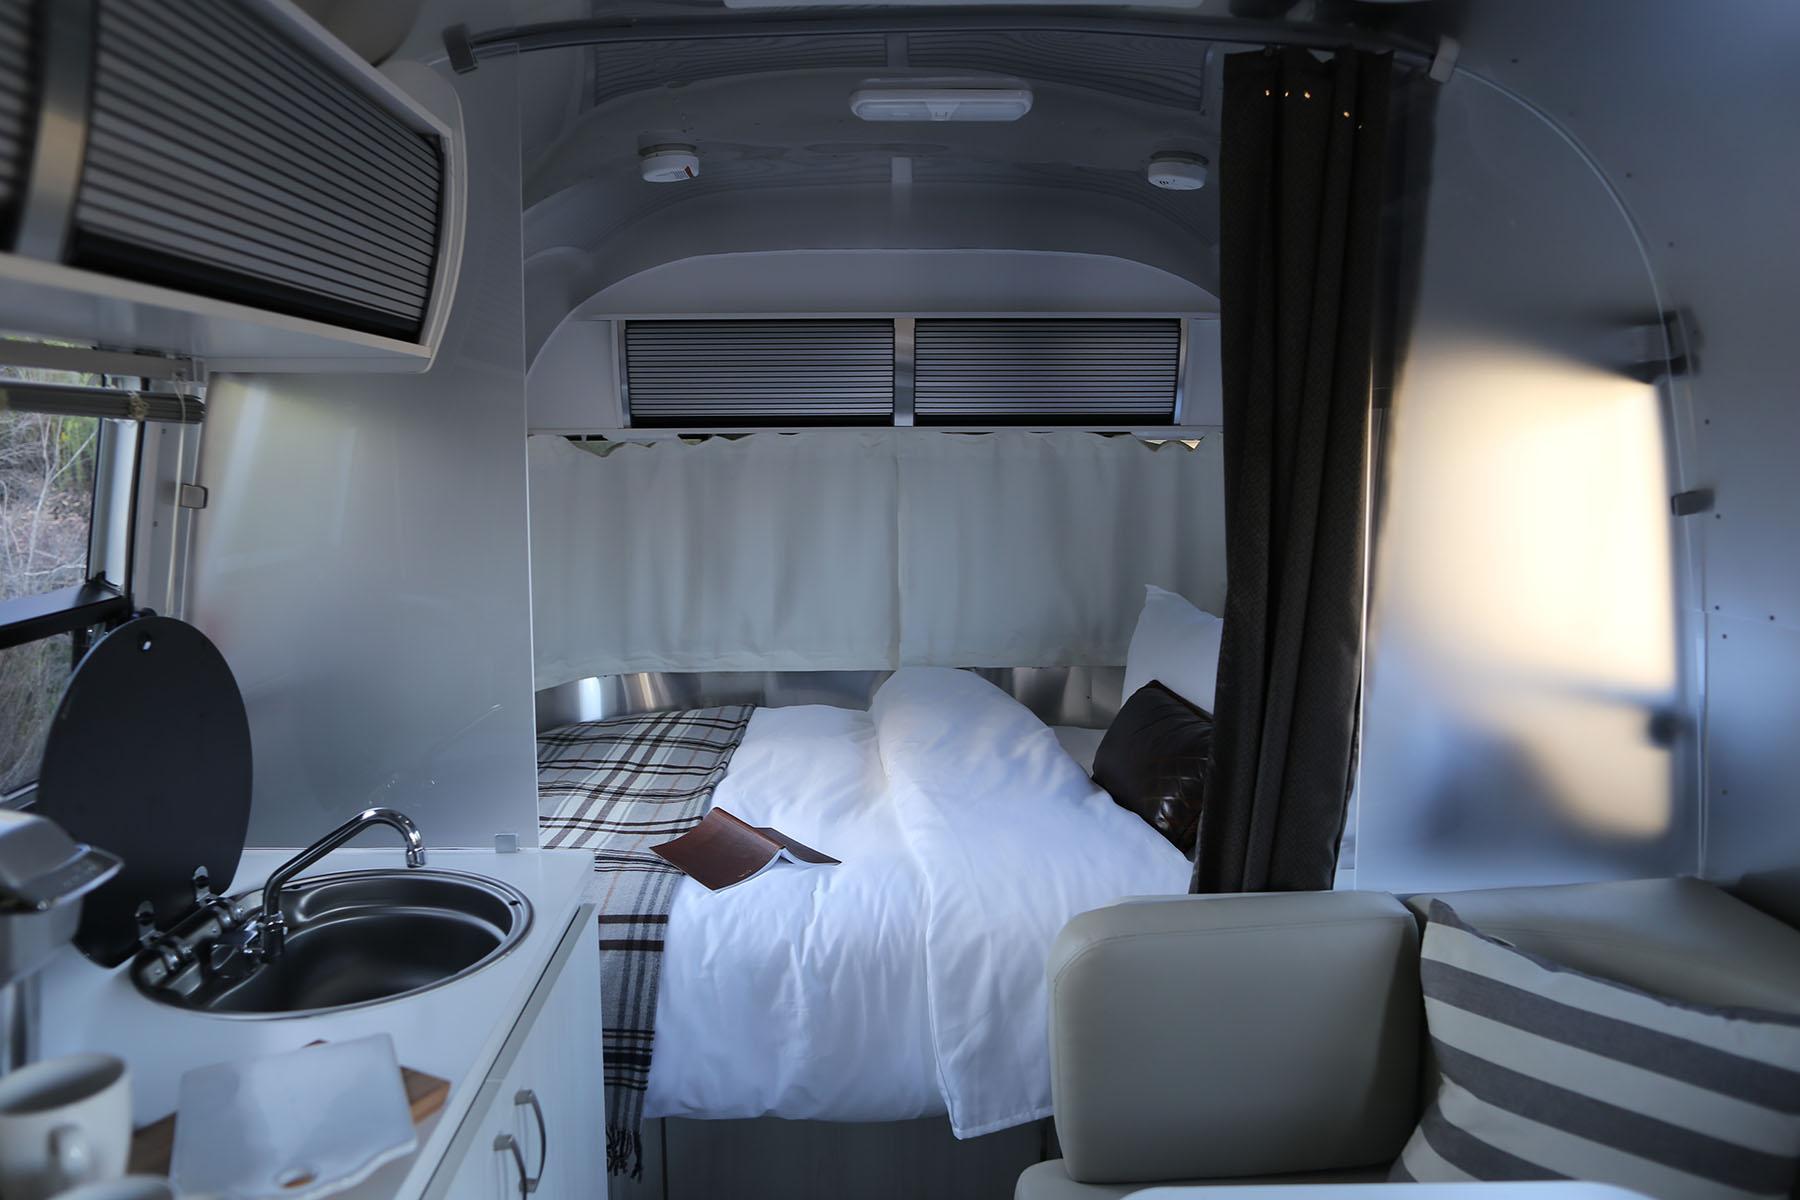 airstream-rental-bambi-sport-22ft-interior-1.JPG